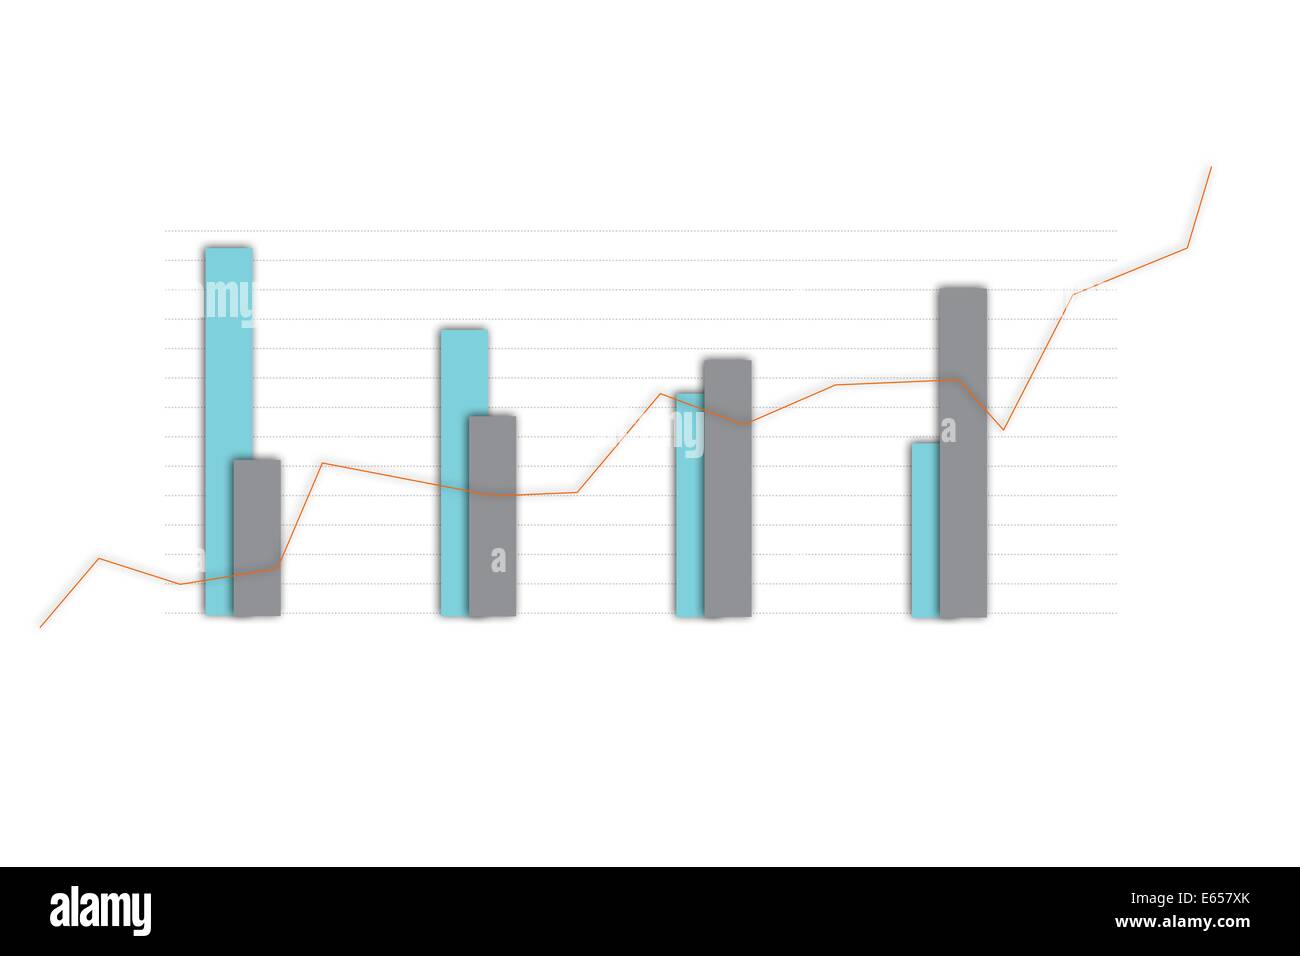 Digitally generated Bar chart analysis - Stock Image